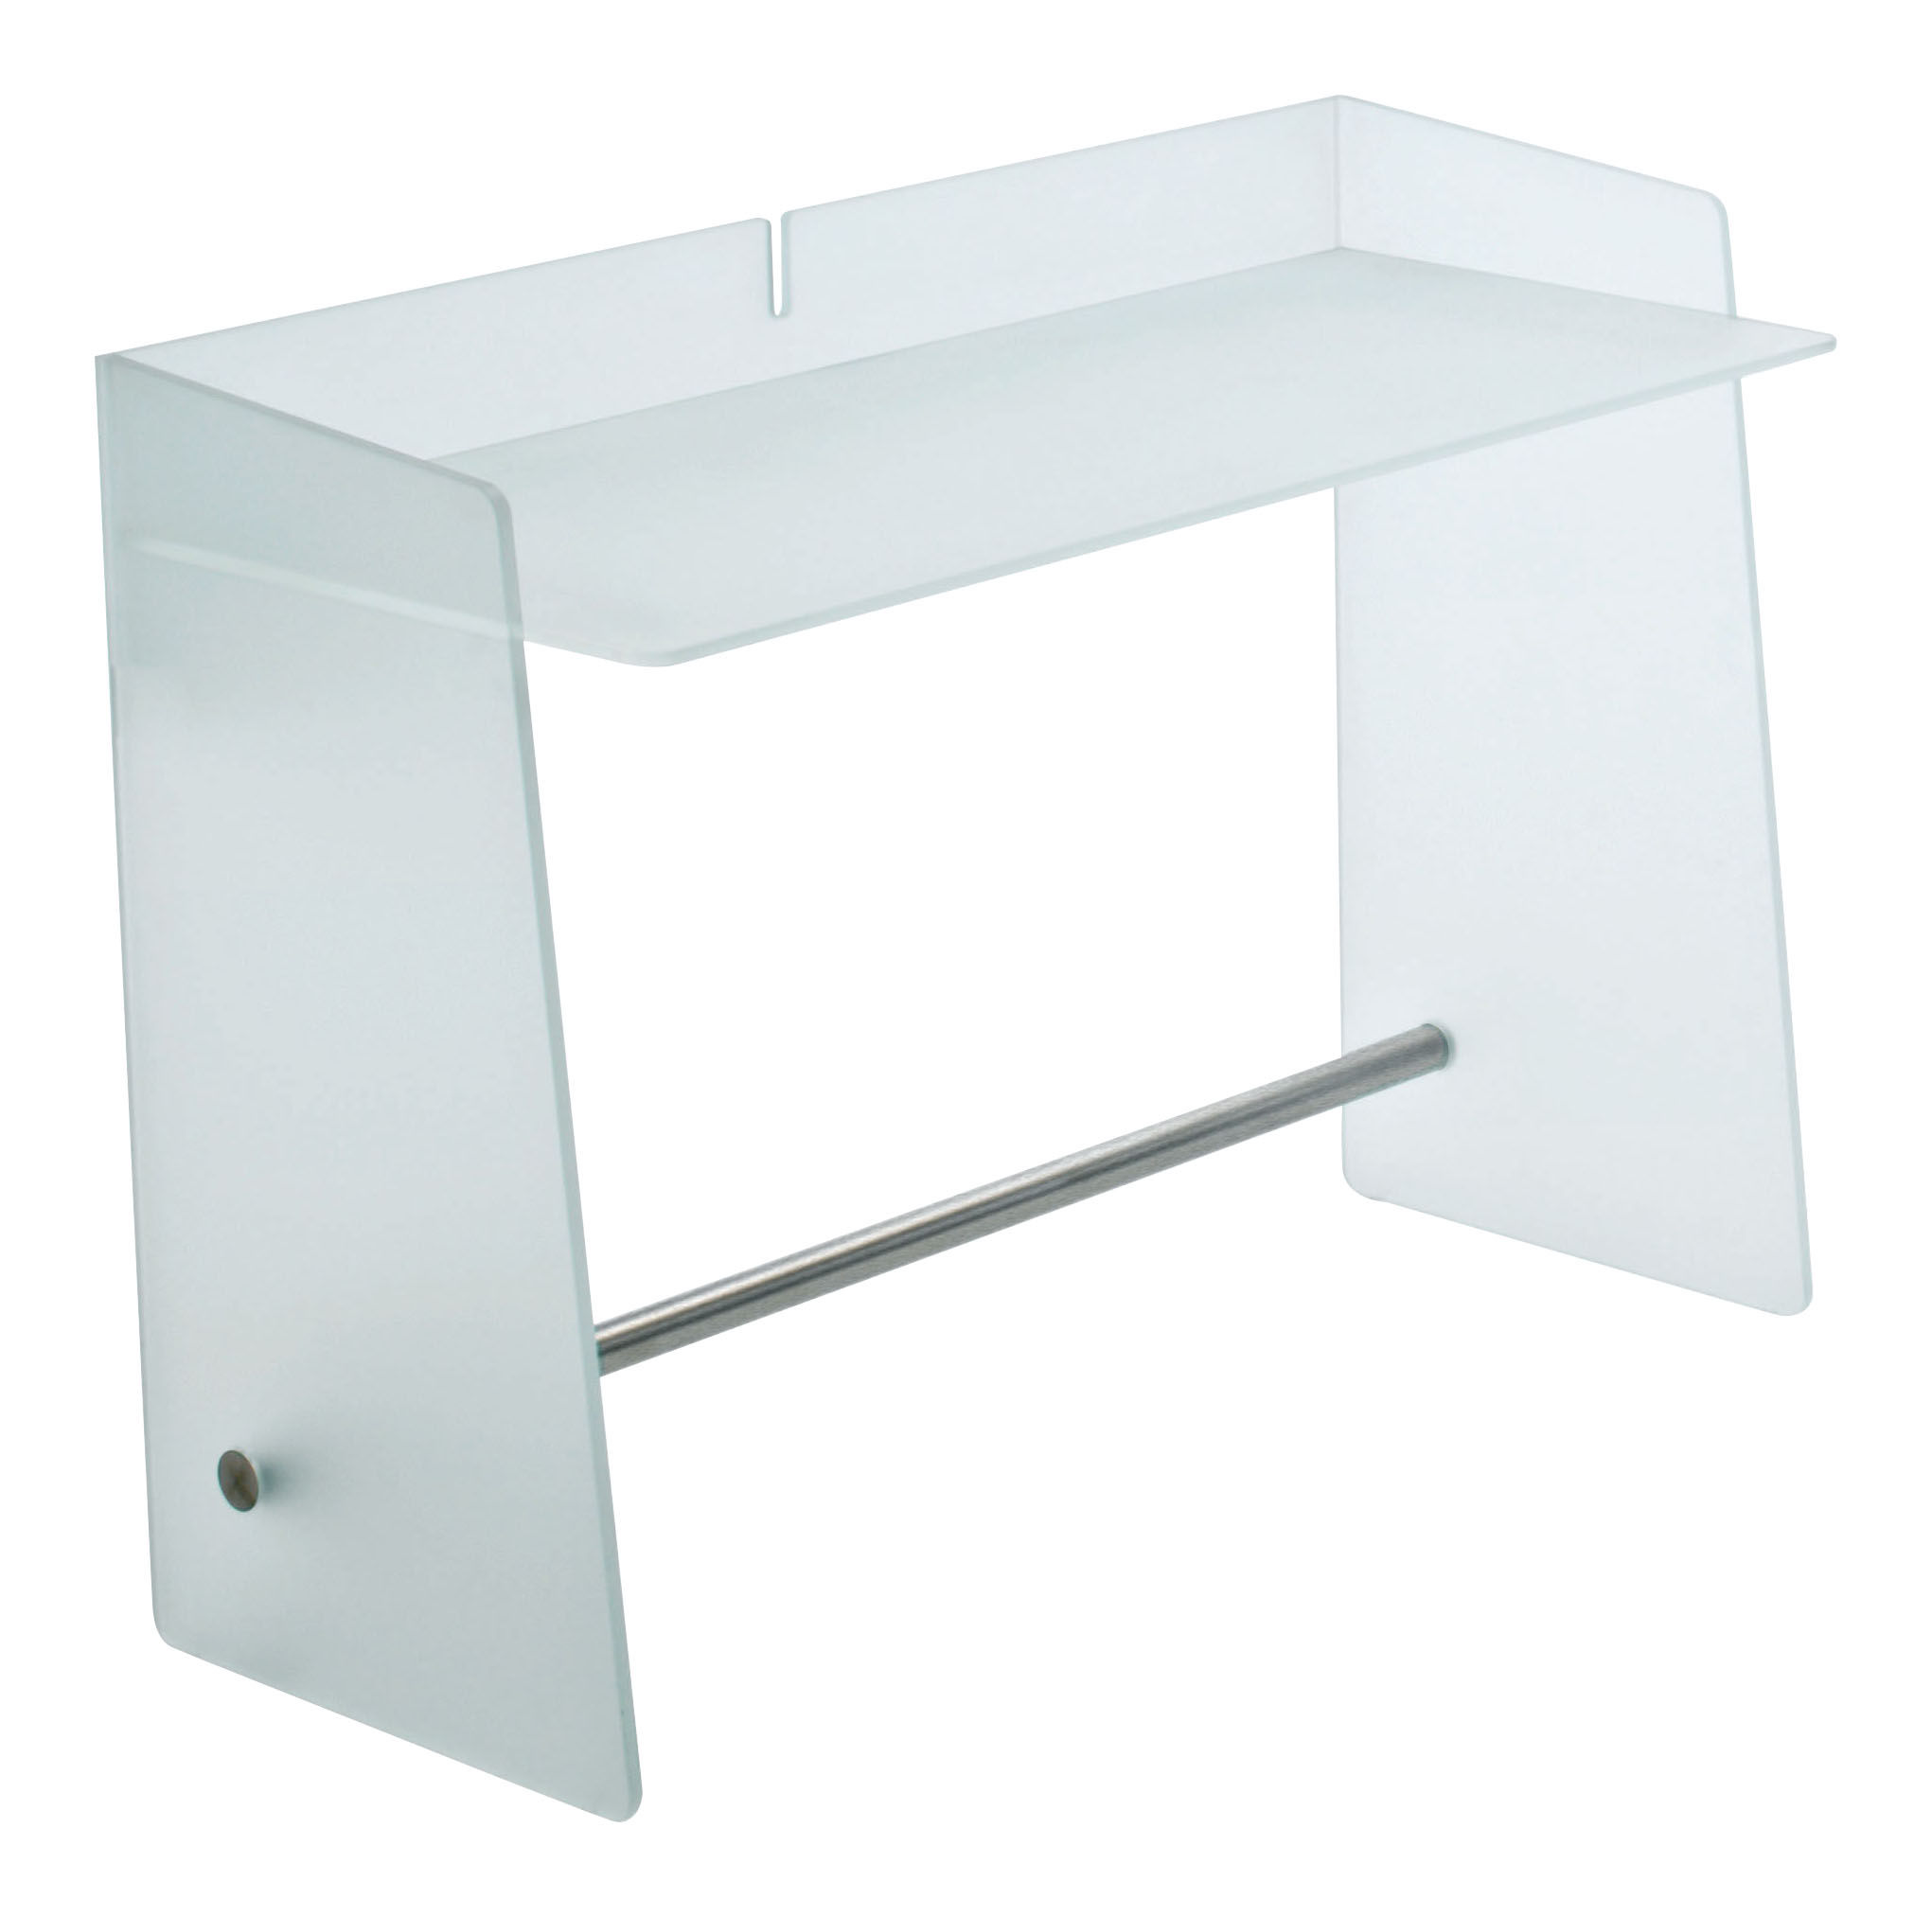 bureau pirandello 110 x 49 cm d poli repose pieds aluminium satin glas italia. Black Bedroom Furniture Sets. Home Design Ideas